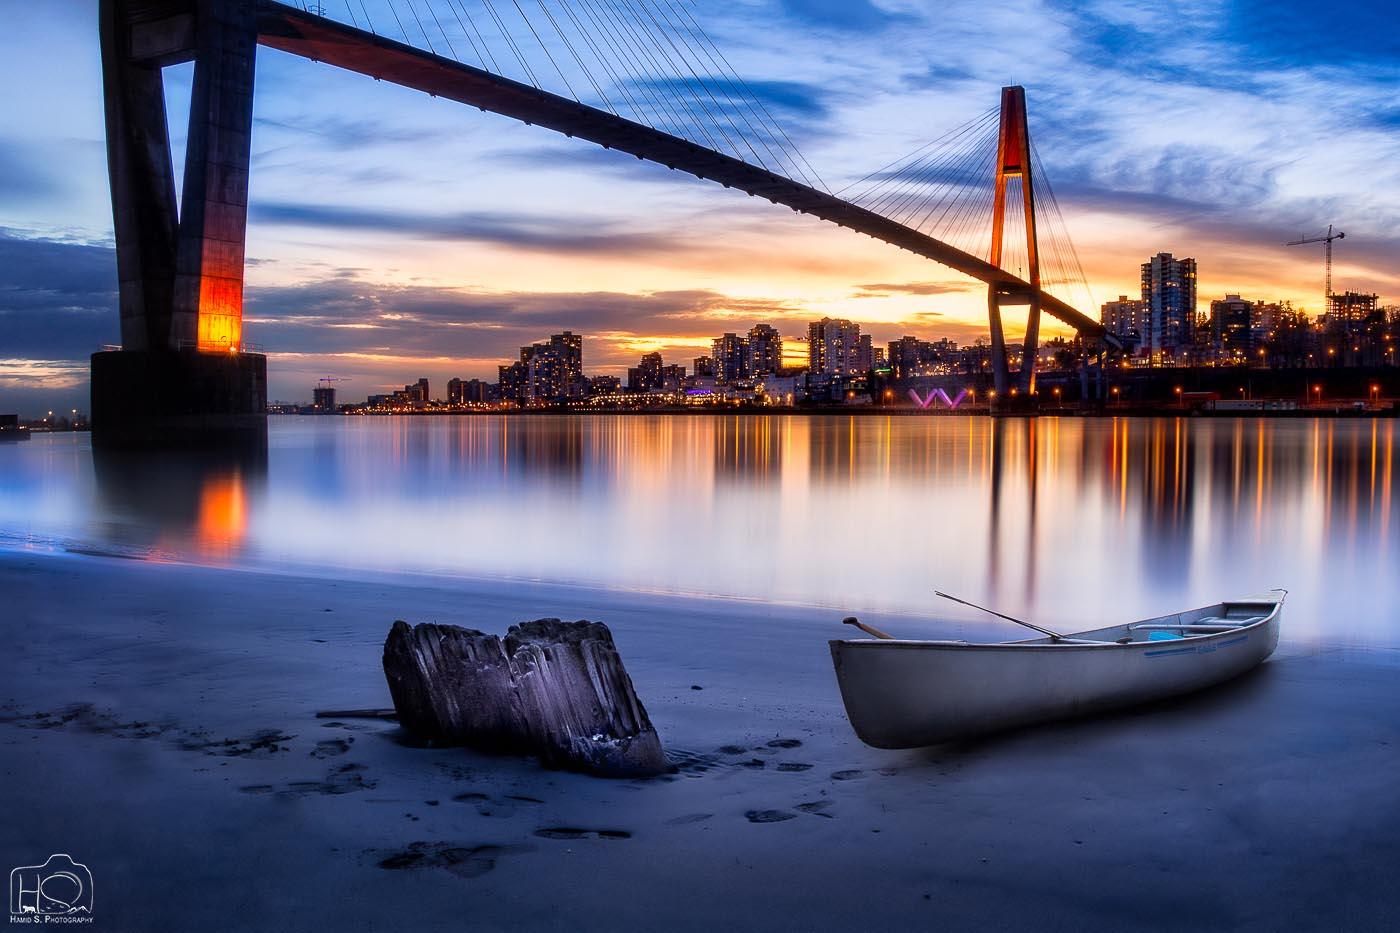 New West Sunset / Hamid Safi